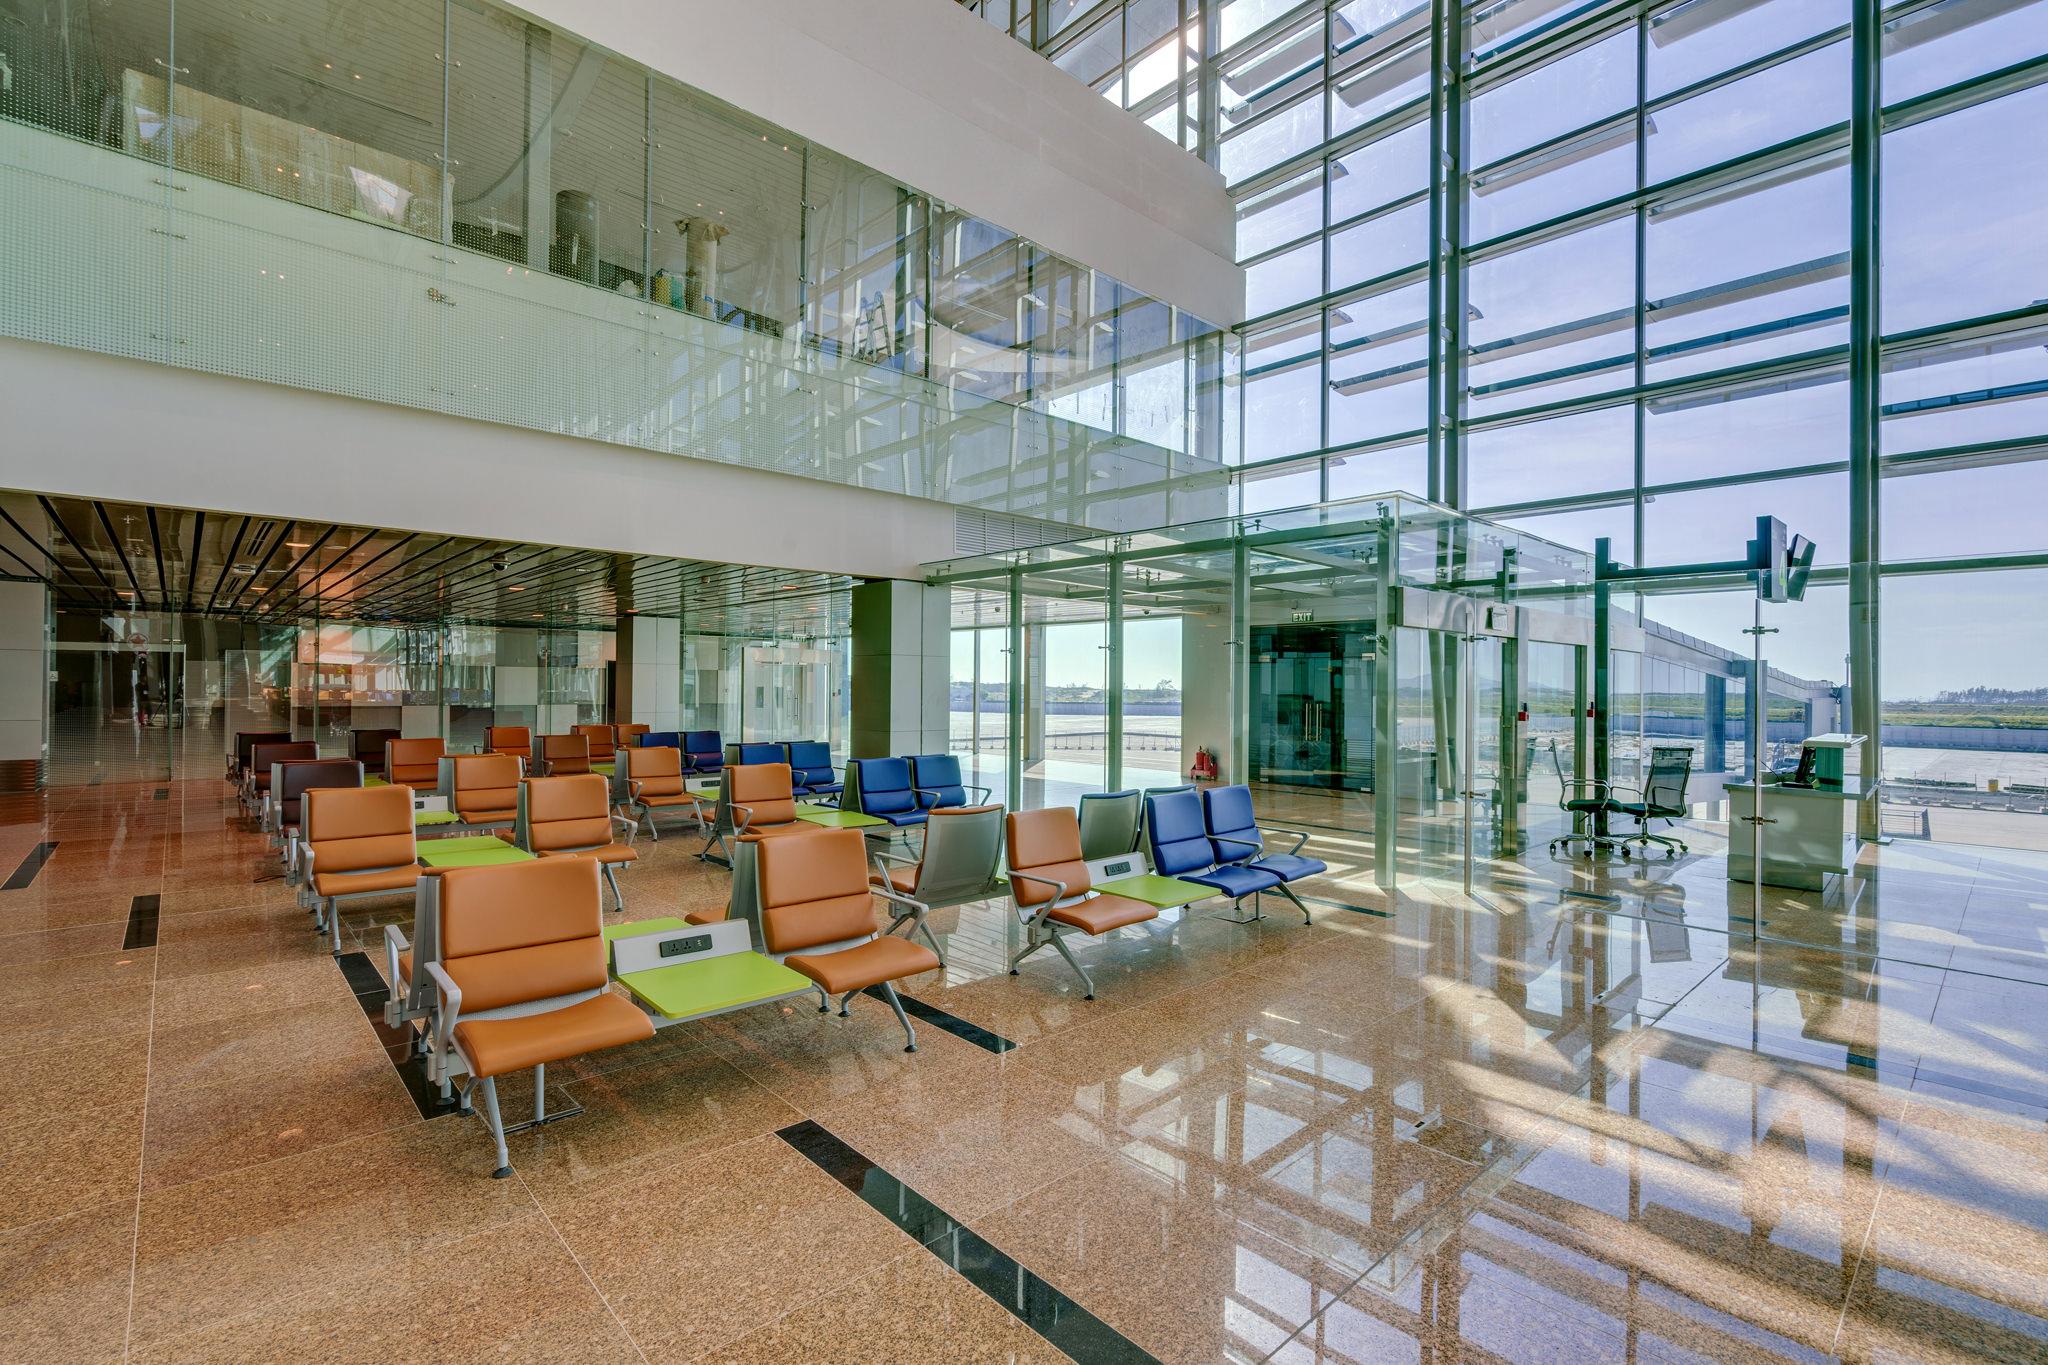 20180626 - Cam Ranh Airport - Architecture - 0194.jpg